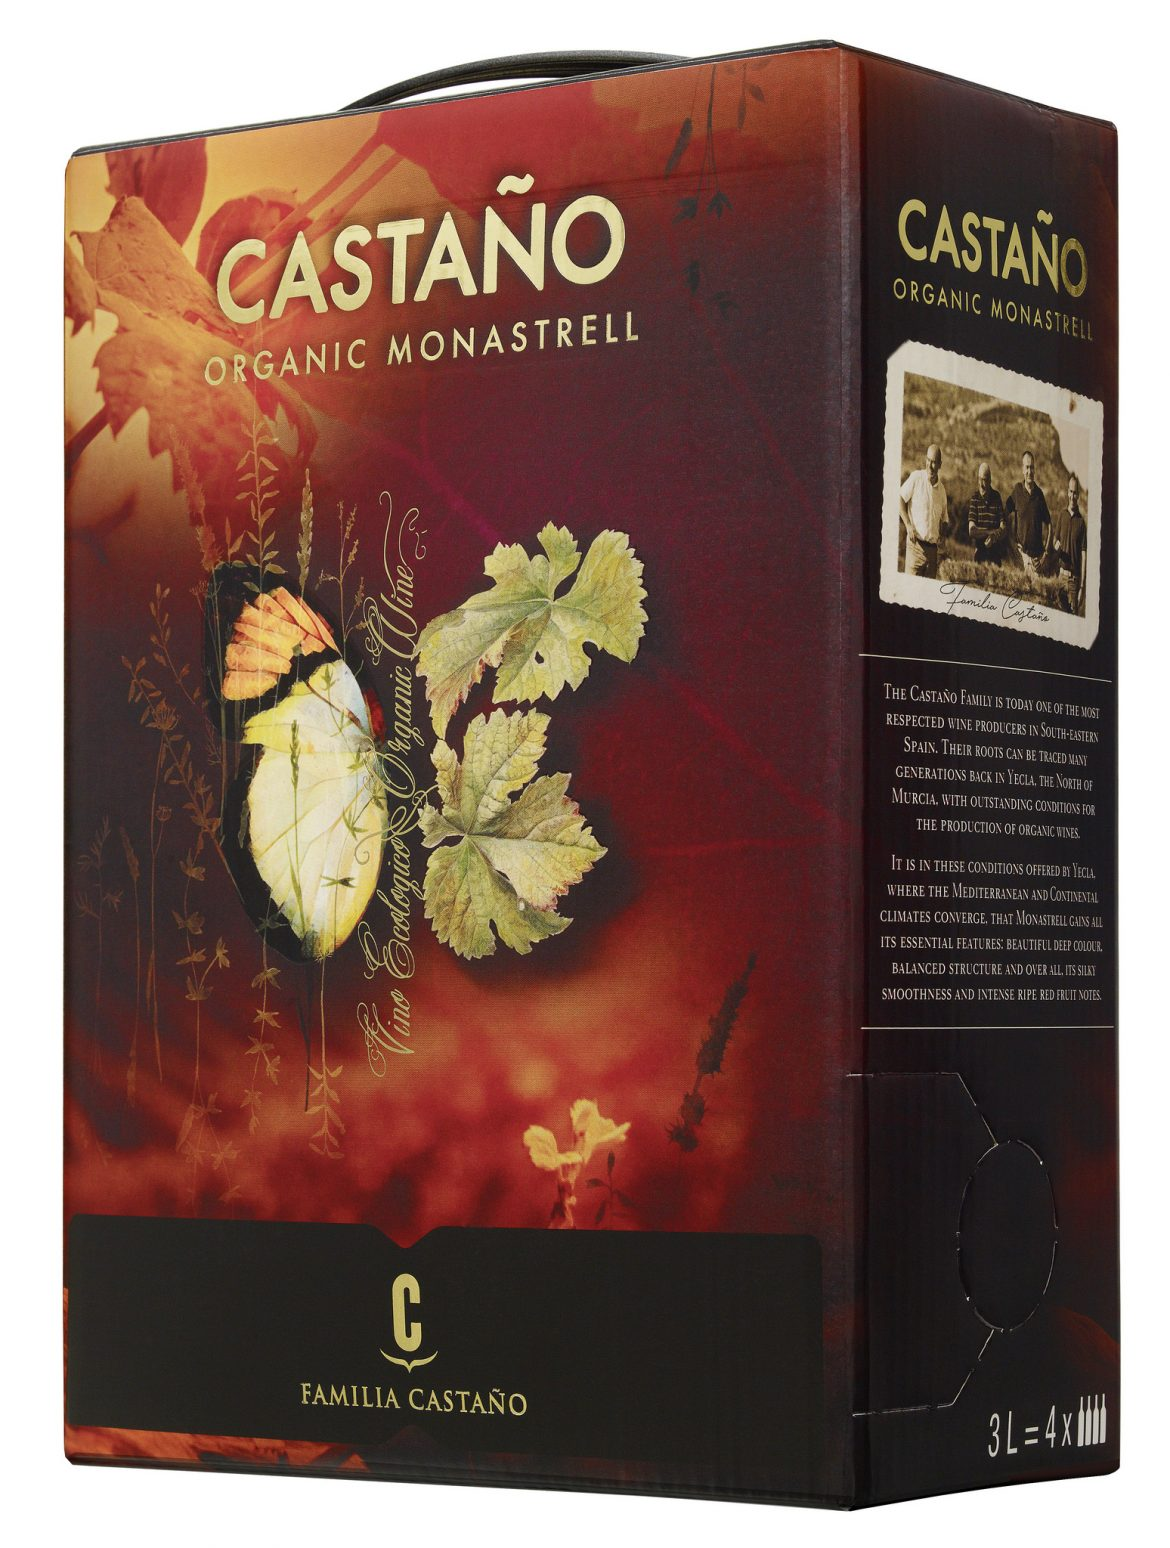 castano organic monastrell